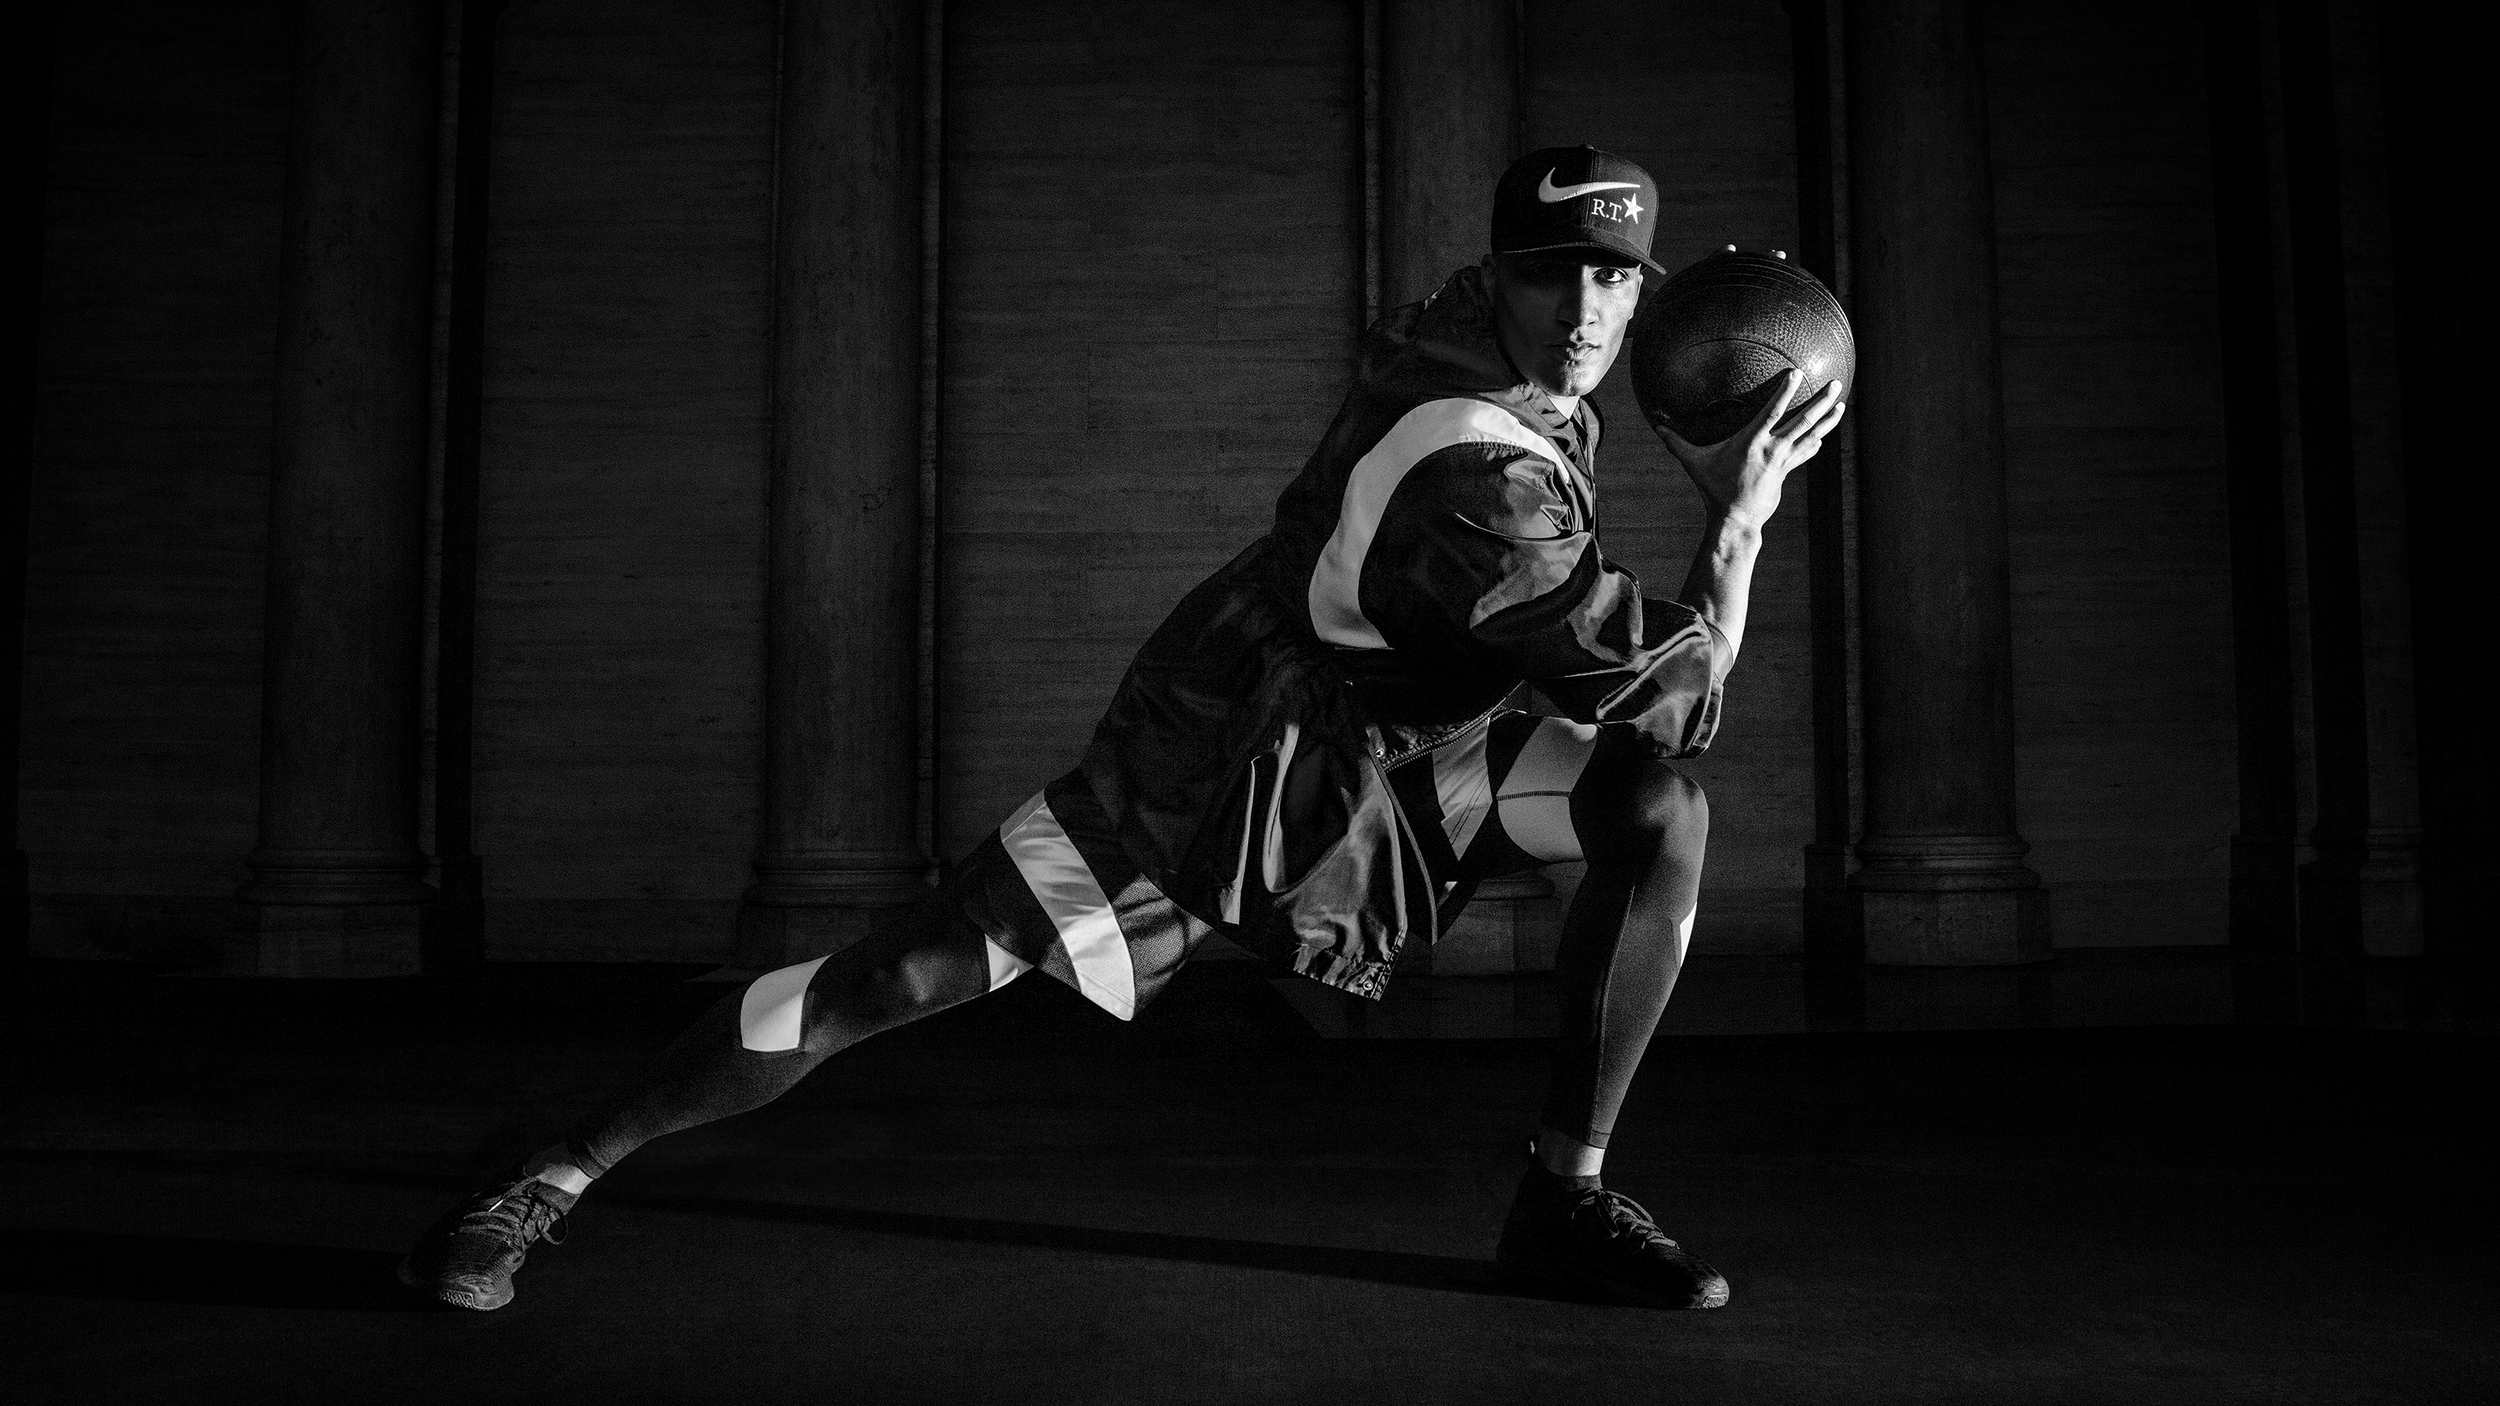 NikeLab-x-RT_2_original.jpg